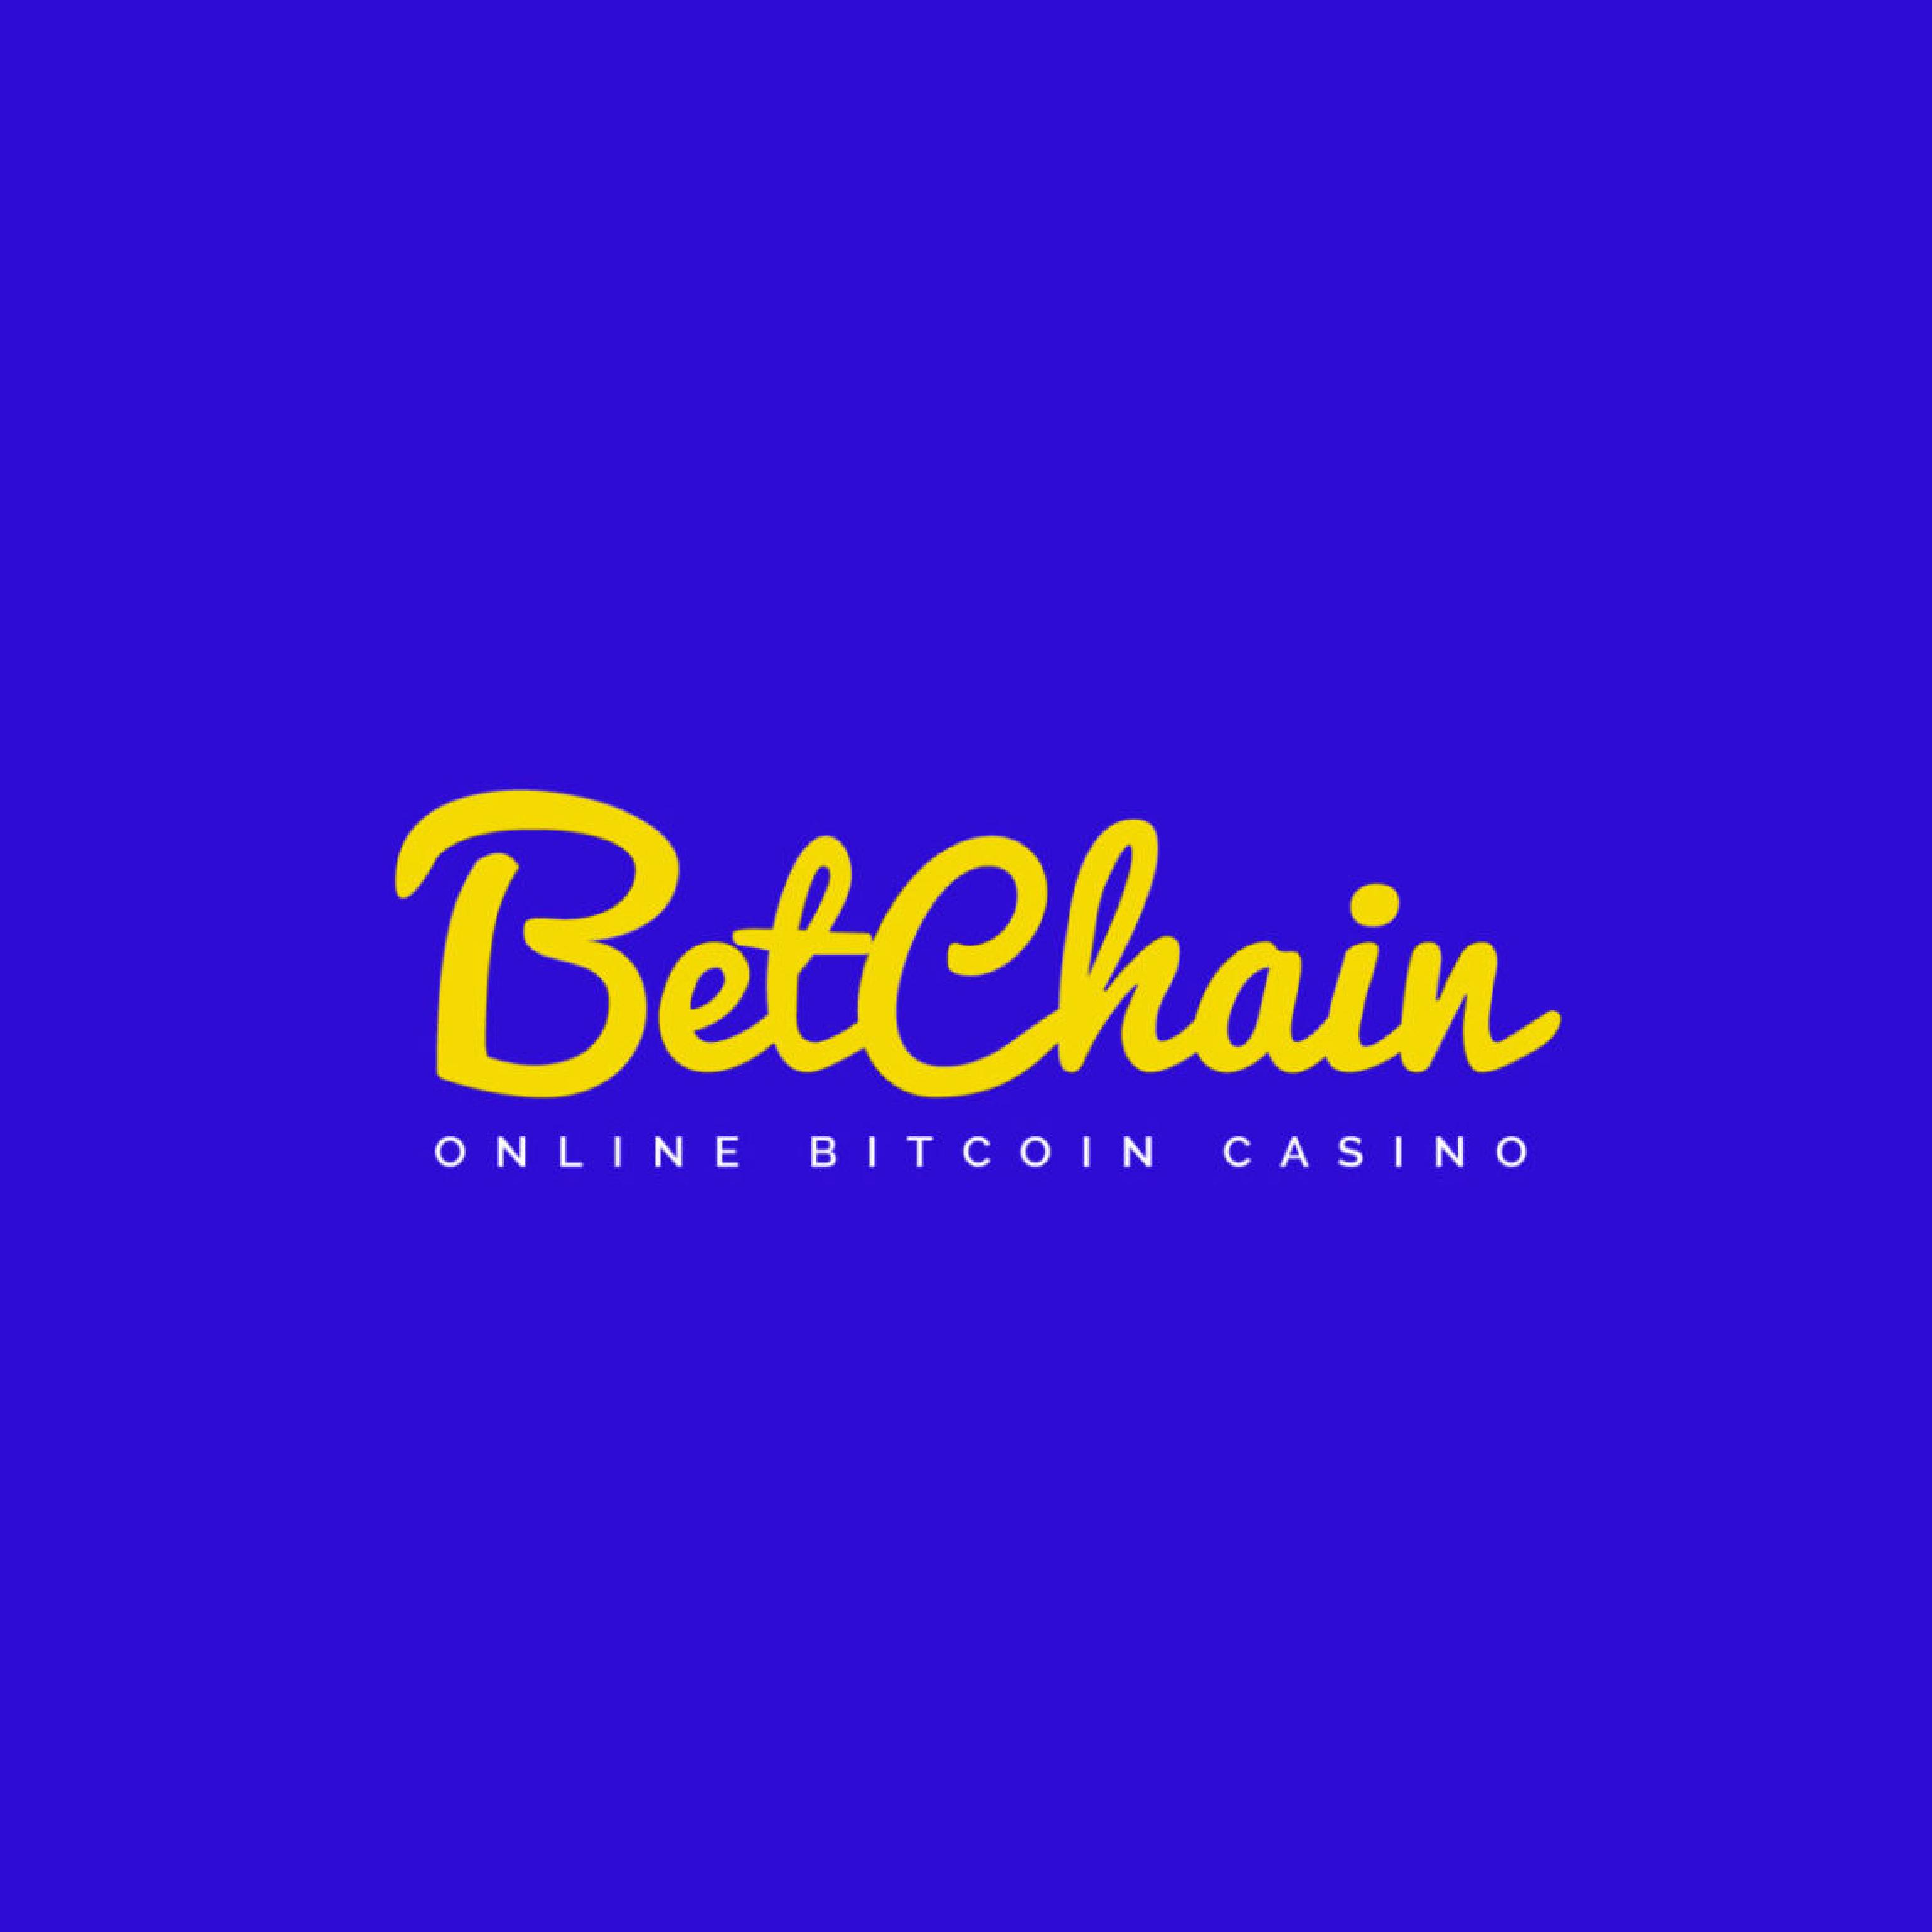 2 betchain crypto casino - Forum